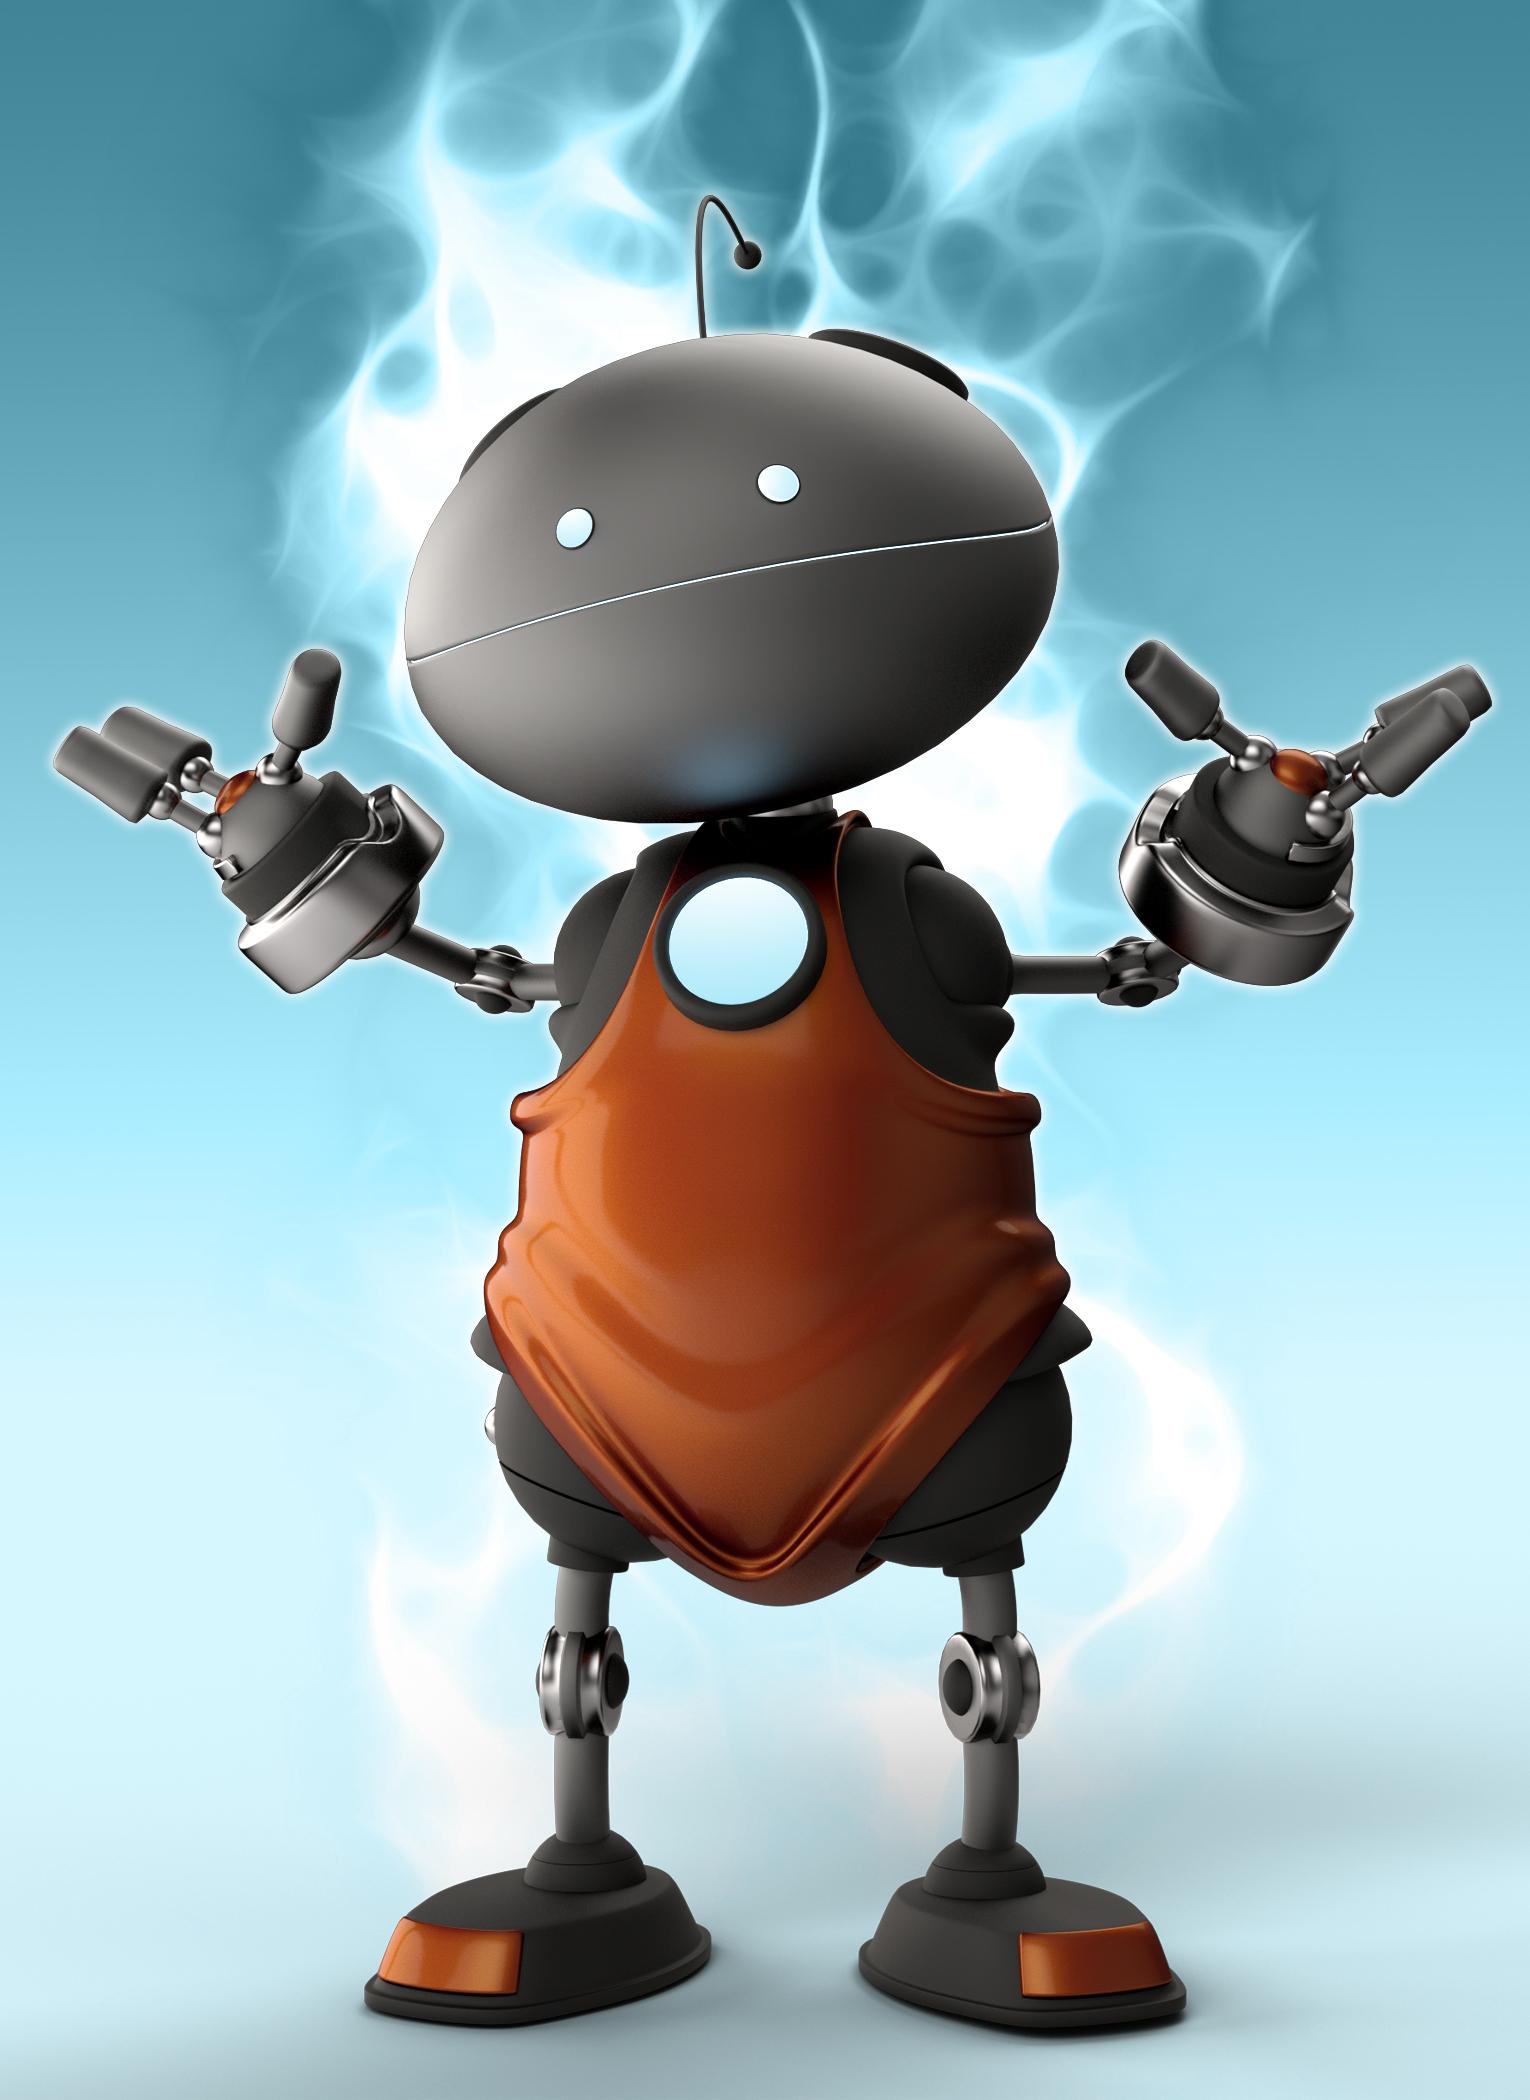 B-Bot by: The AntFarm, 3D Models by Daz 3D